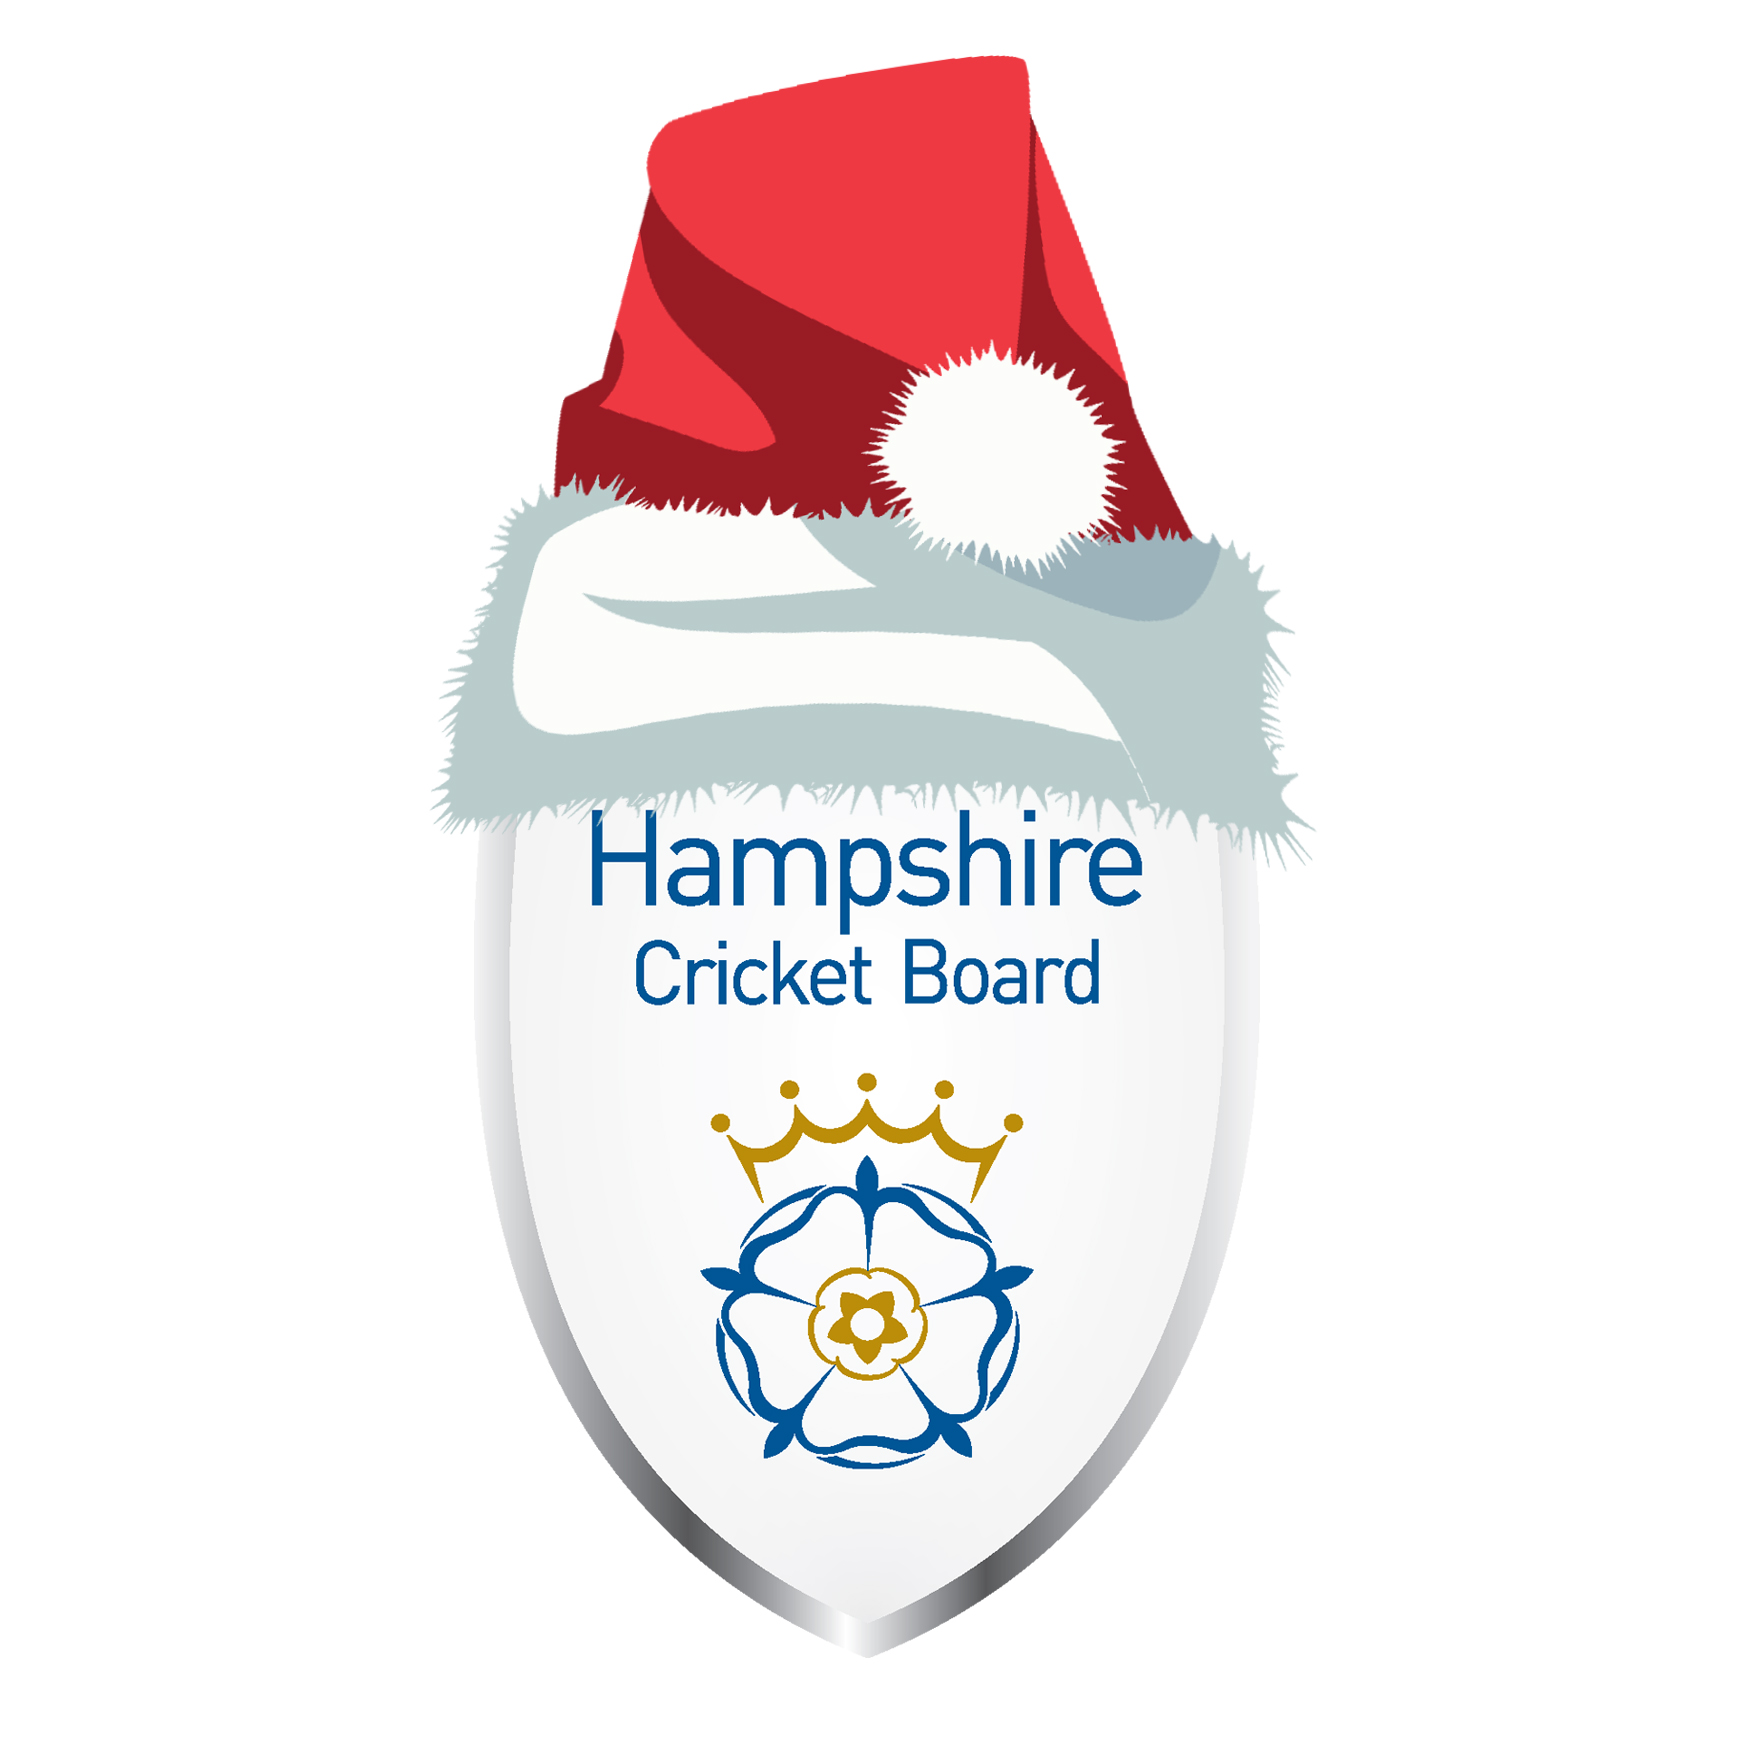 Hampshire Cricket Board christmas logo